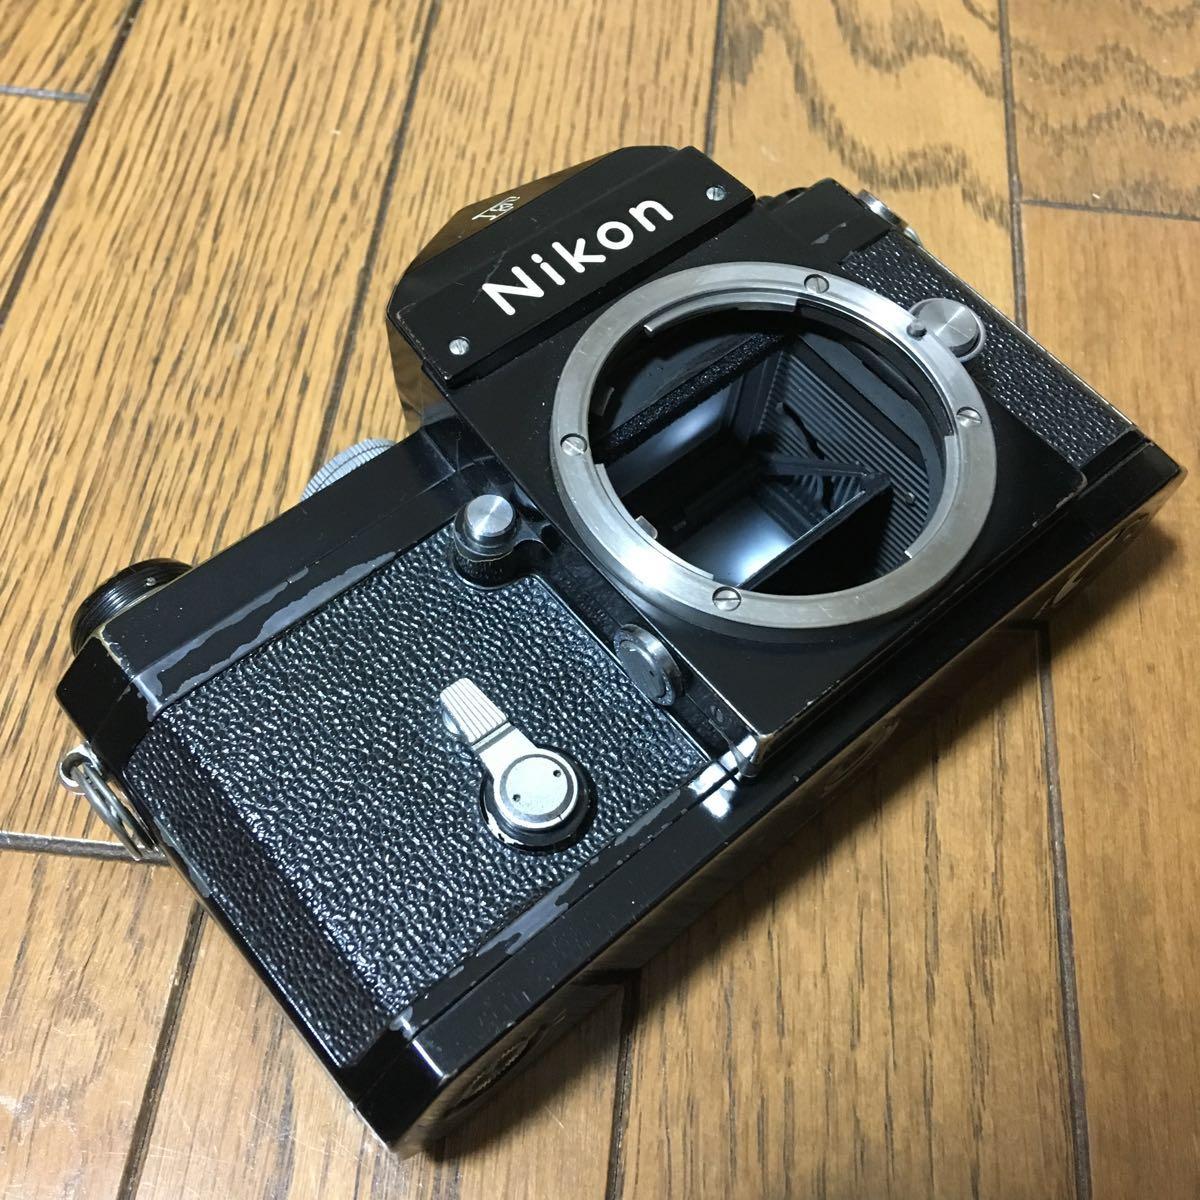 Nikon F アイレベル ブラック ボディ 646万台 前期型 動作確認済みです。_画像8